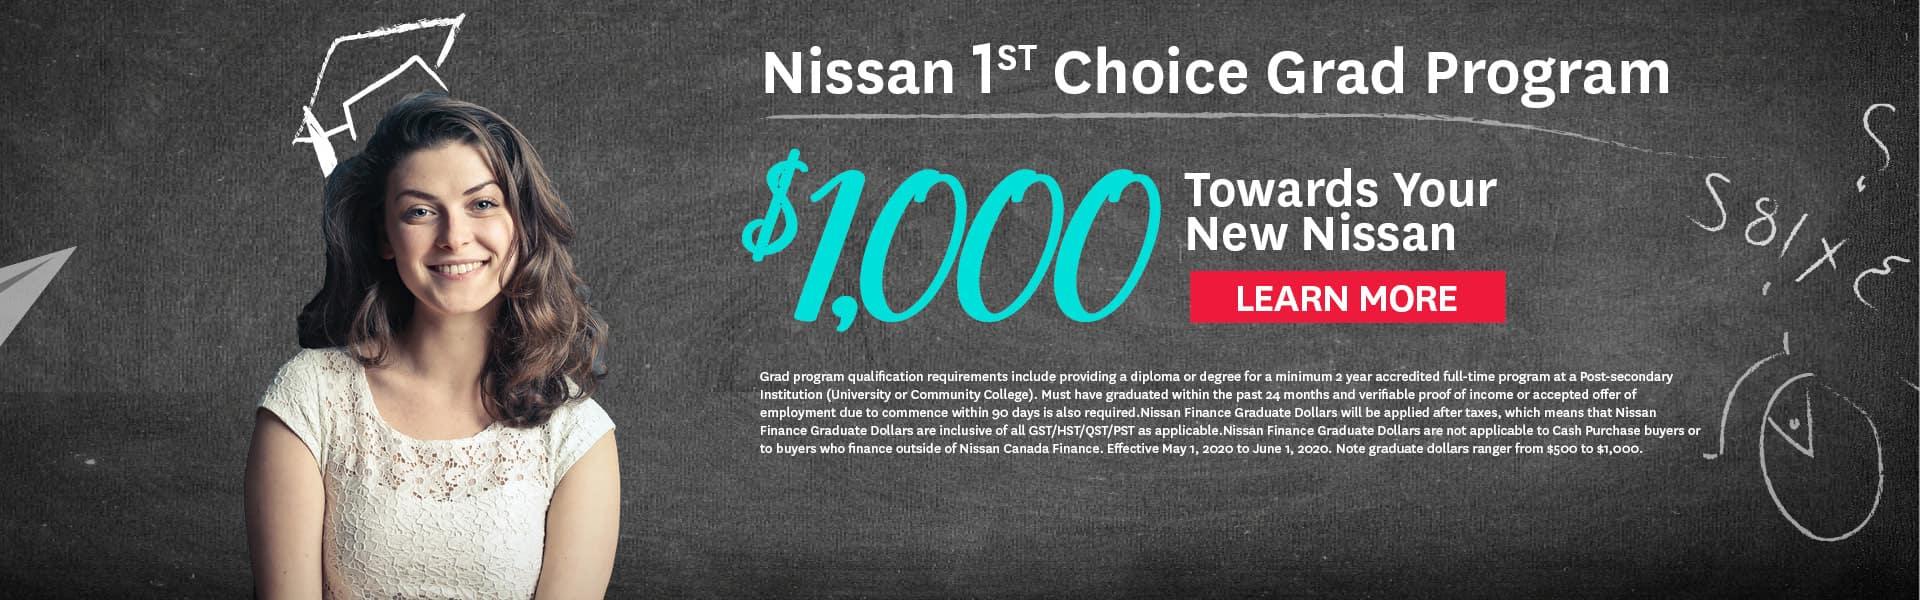 Nissan_Grad_Program_Home_Page_Banner_Desktop_May2020